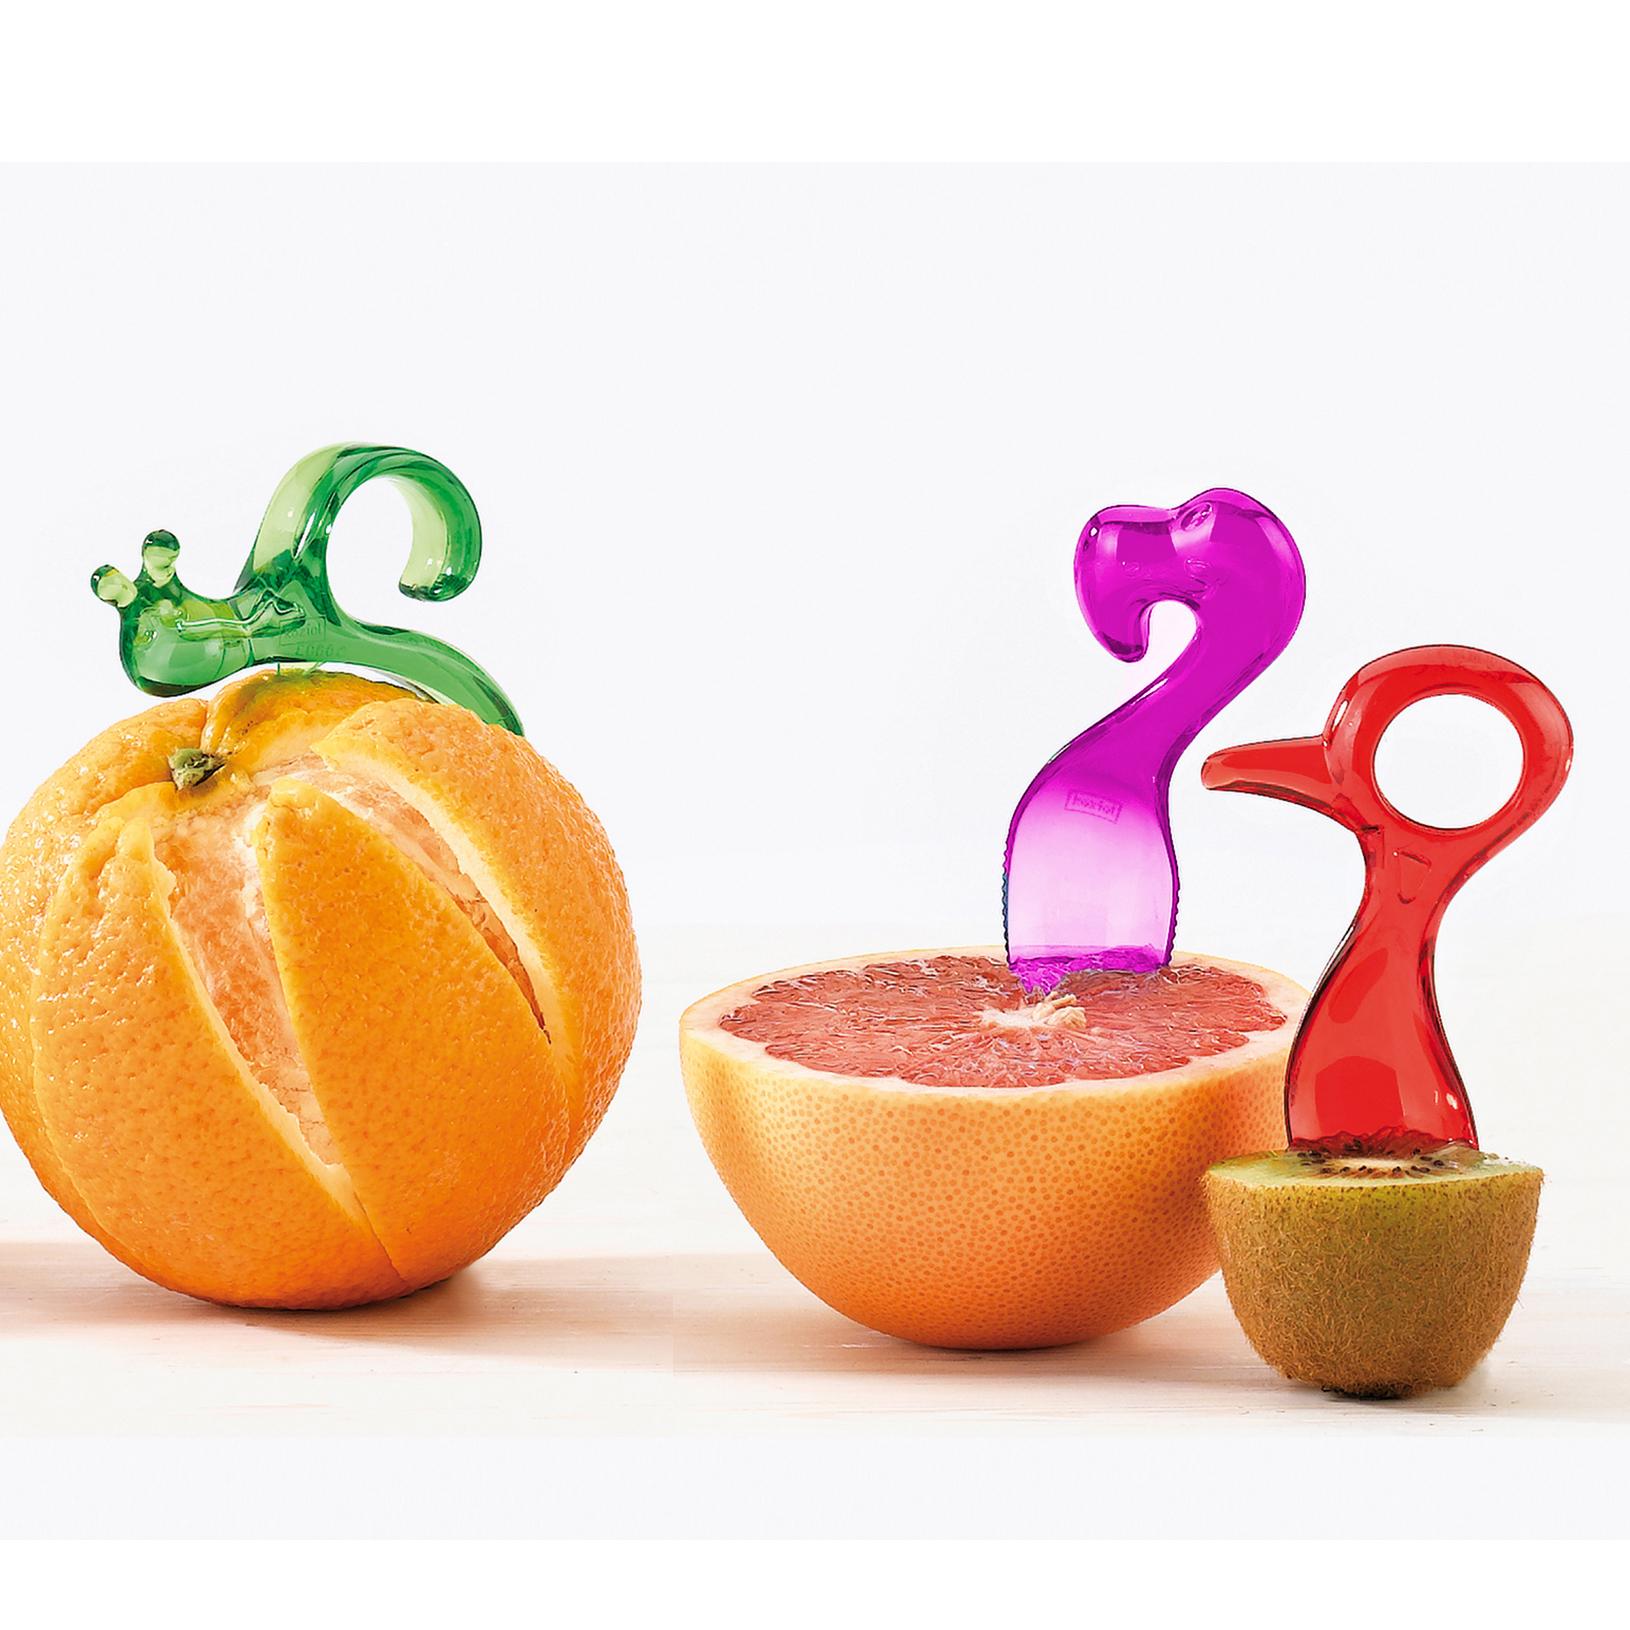 koziol ideas for friends gmbh fresh vitamins gift set. Black Bedroom Furniture Sets. Home Design Ideas